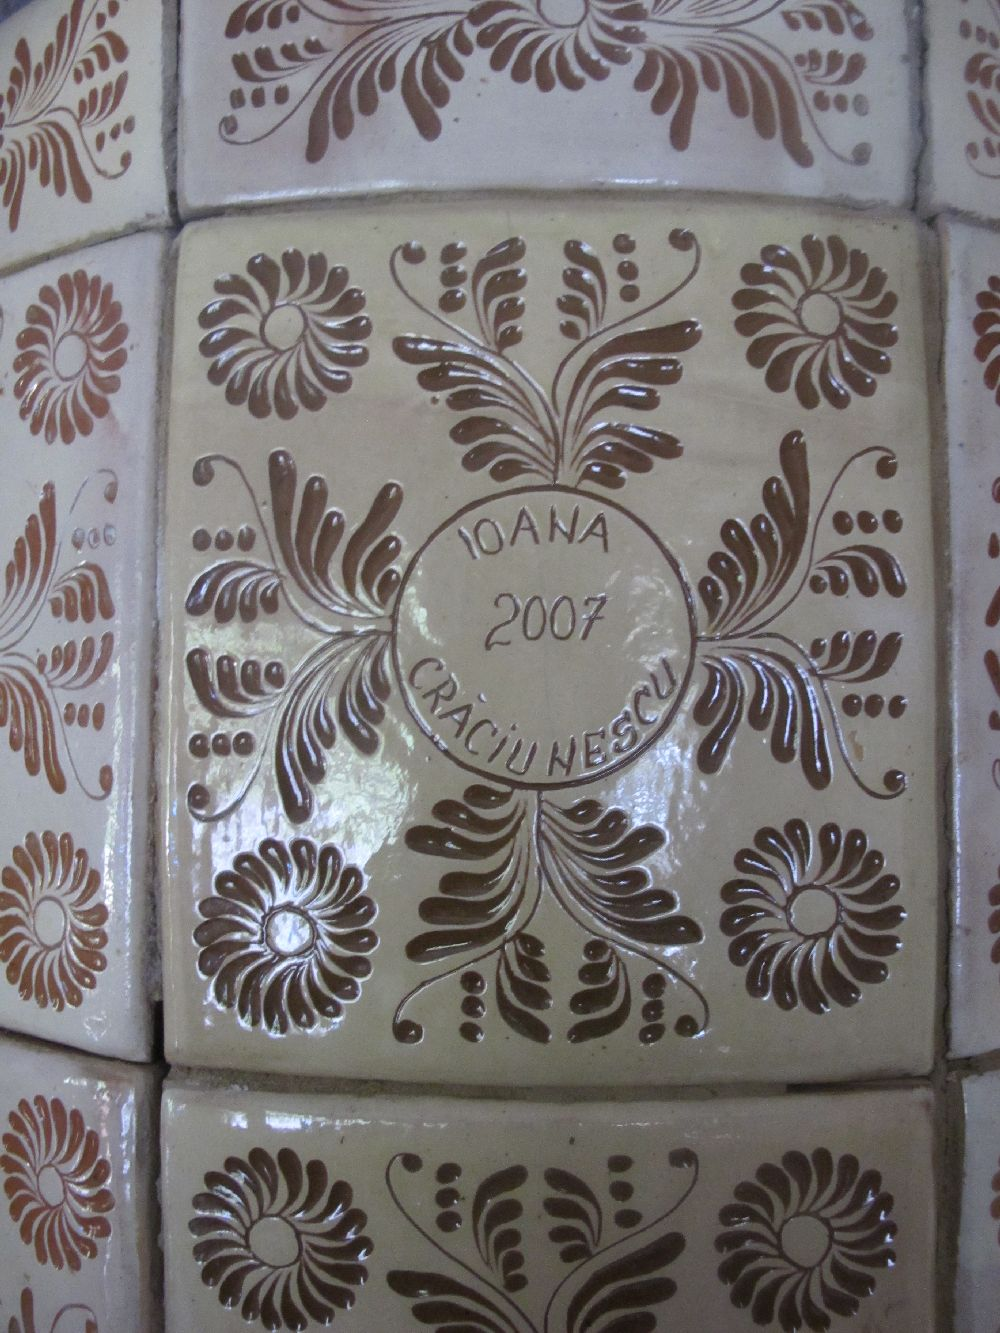 adelaparvu.com despre casa Ioanei Craciunescu, casa taraneasca romaneasca (62)